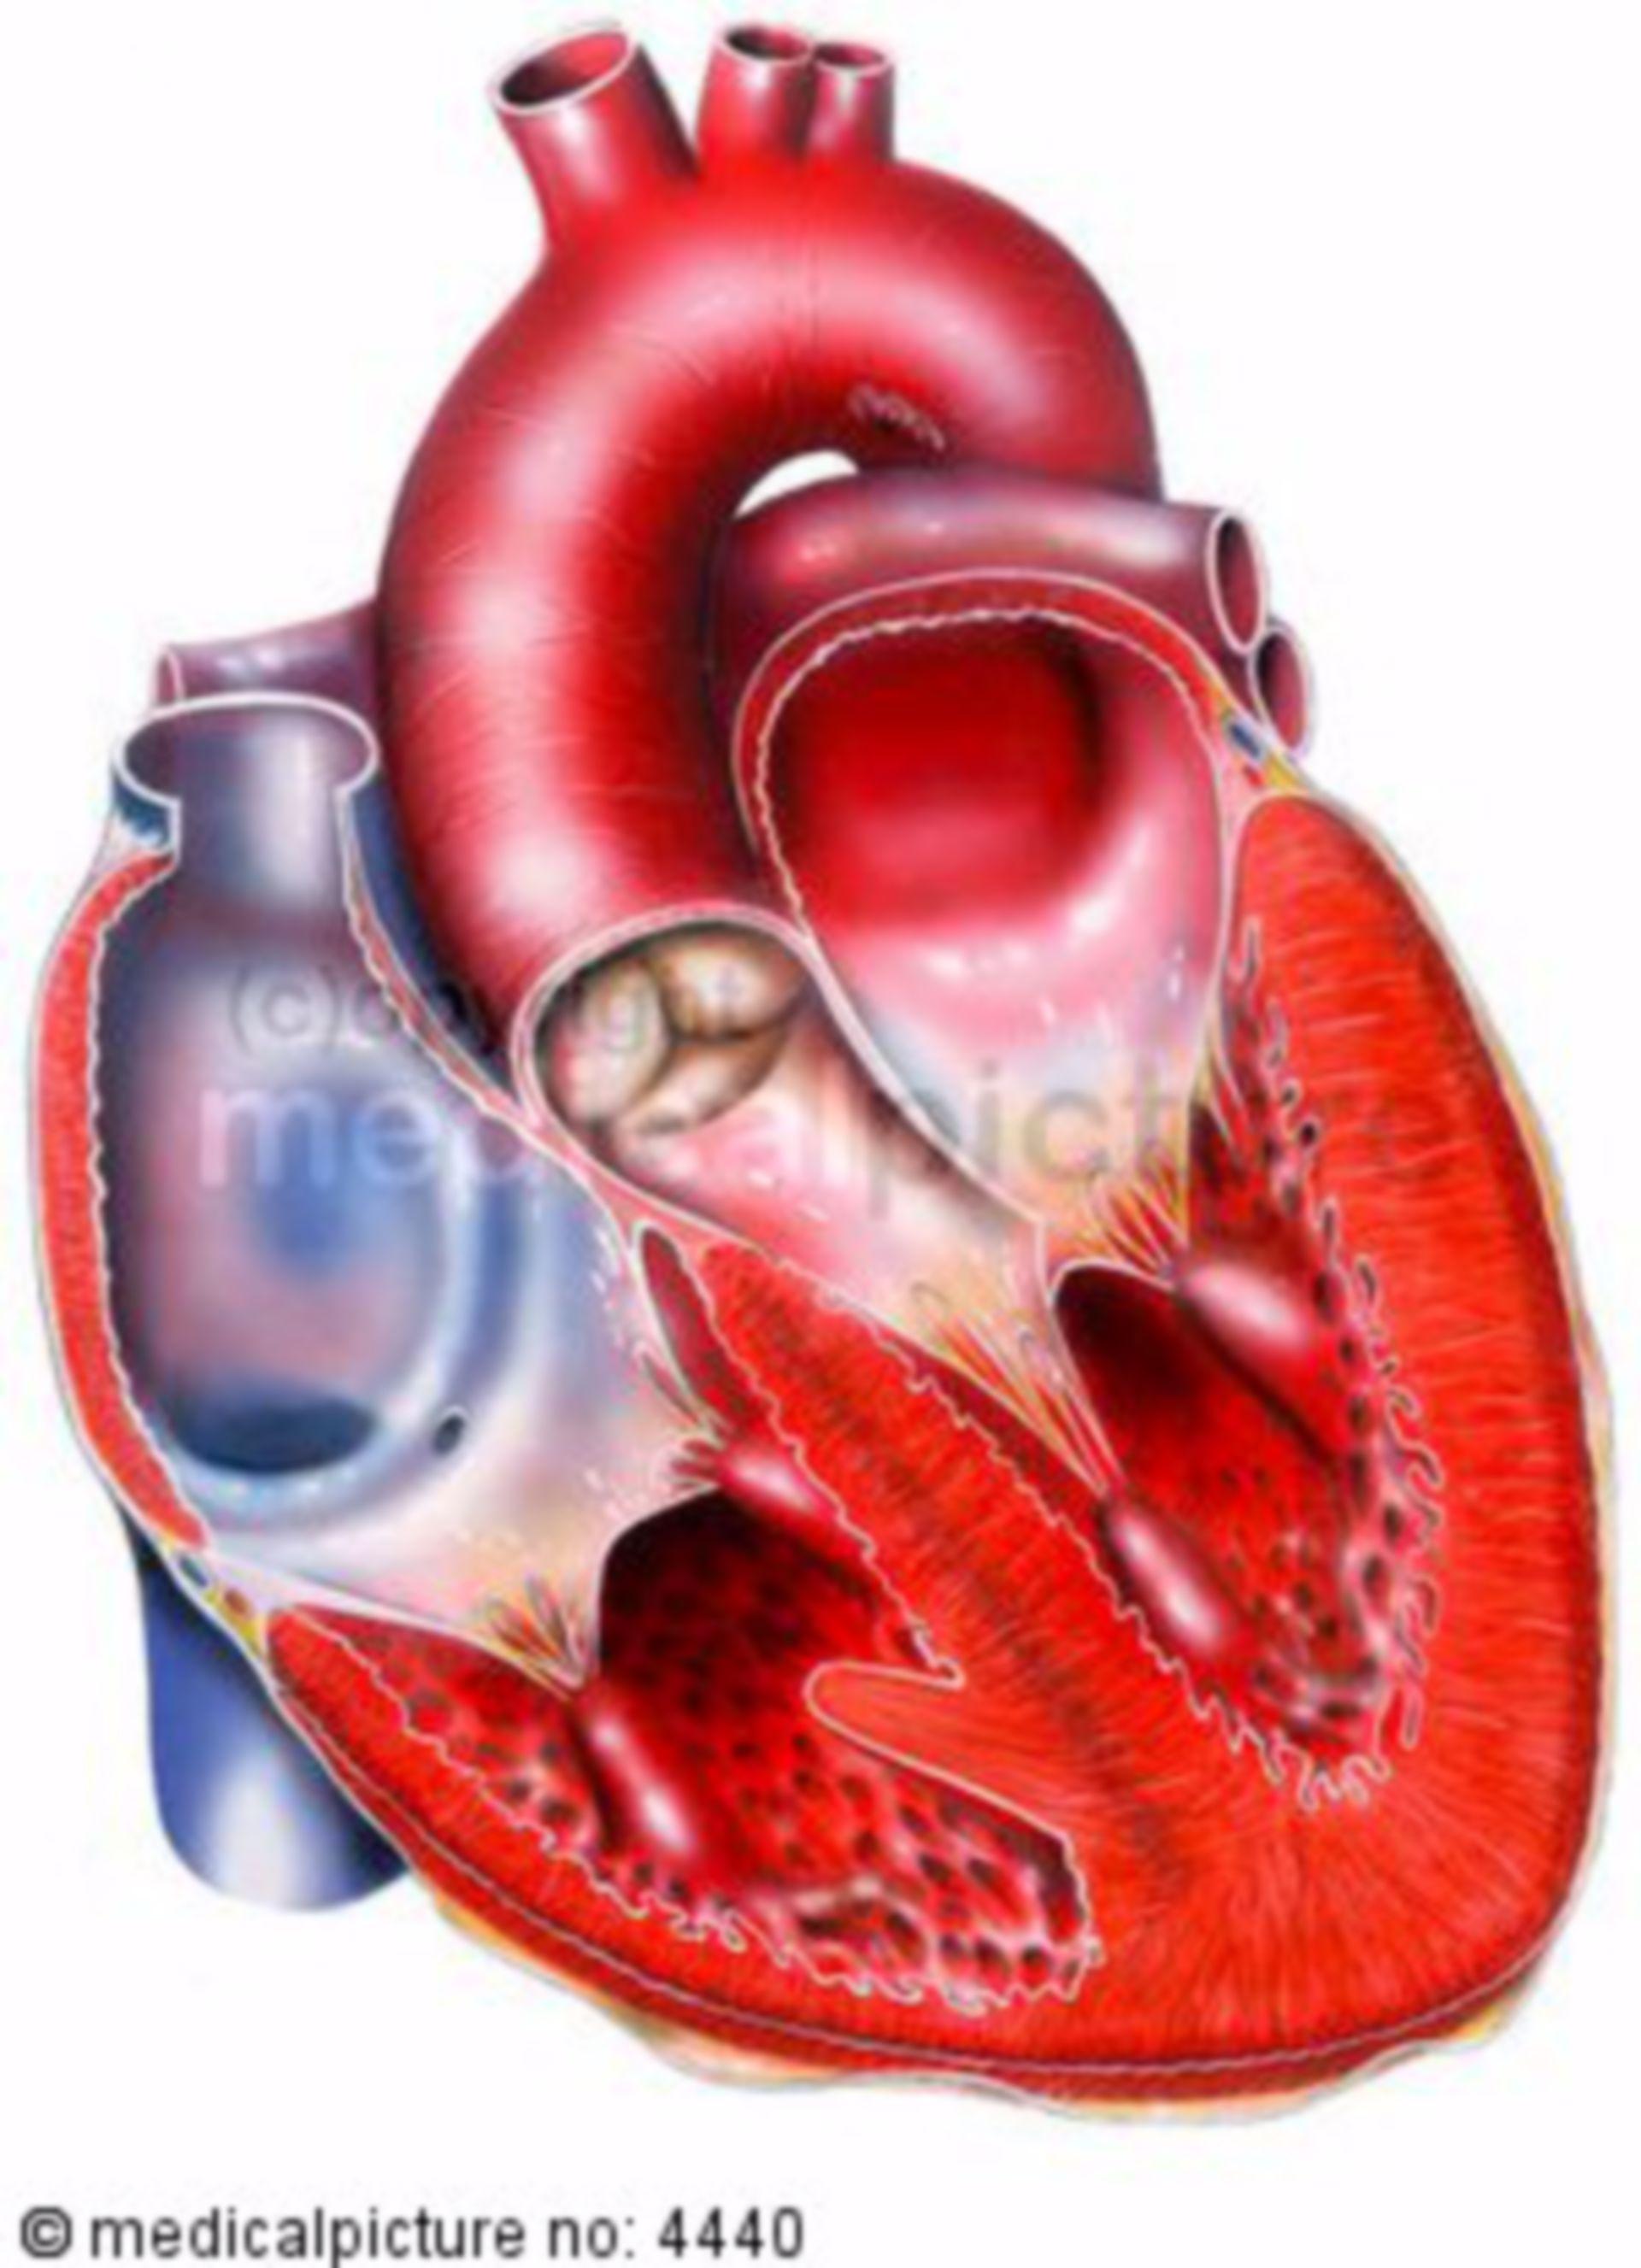 Heart, anatomical model